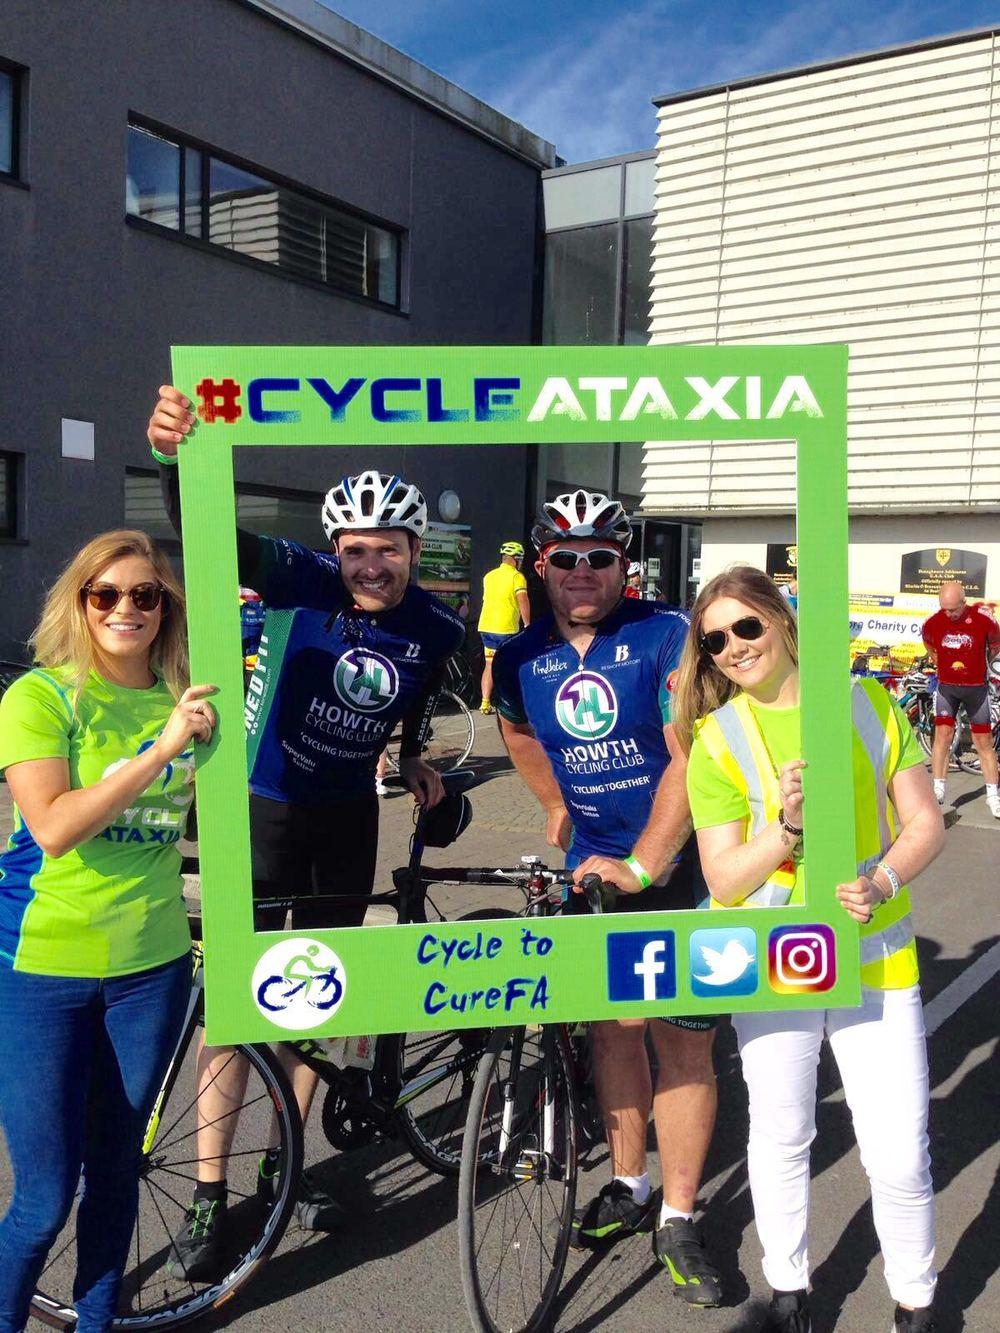 Cycle Ataxia Venue (77).JPG